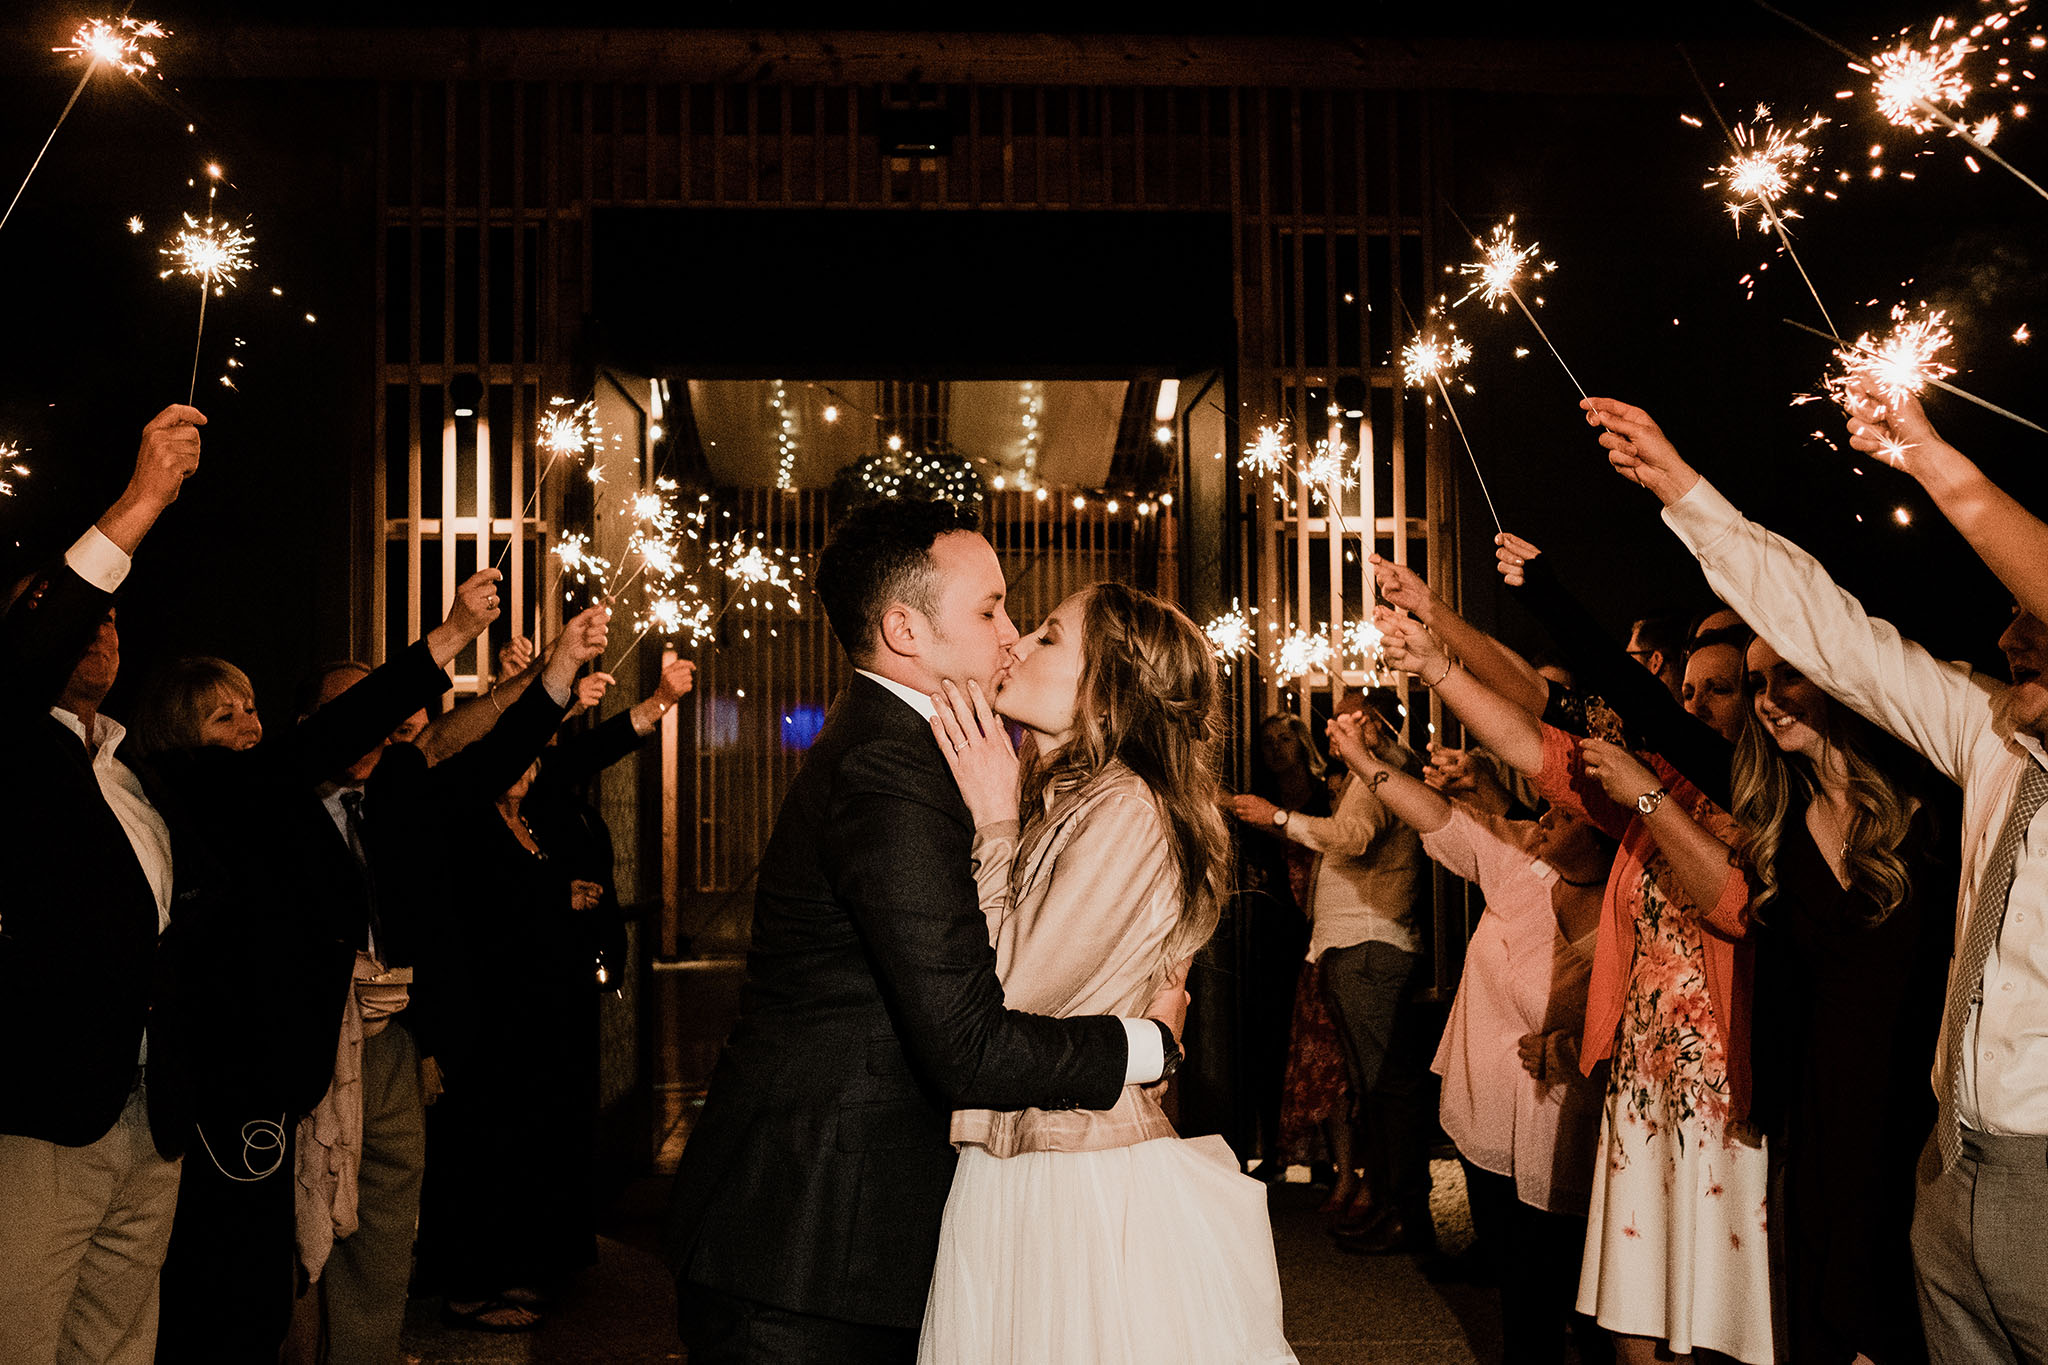 Arizona-Wedding-Photographer-The-Paseo-Venue60.jpg